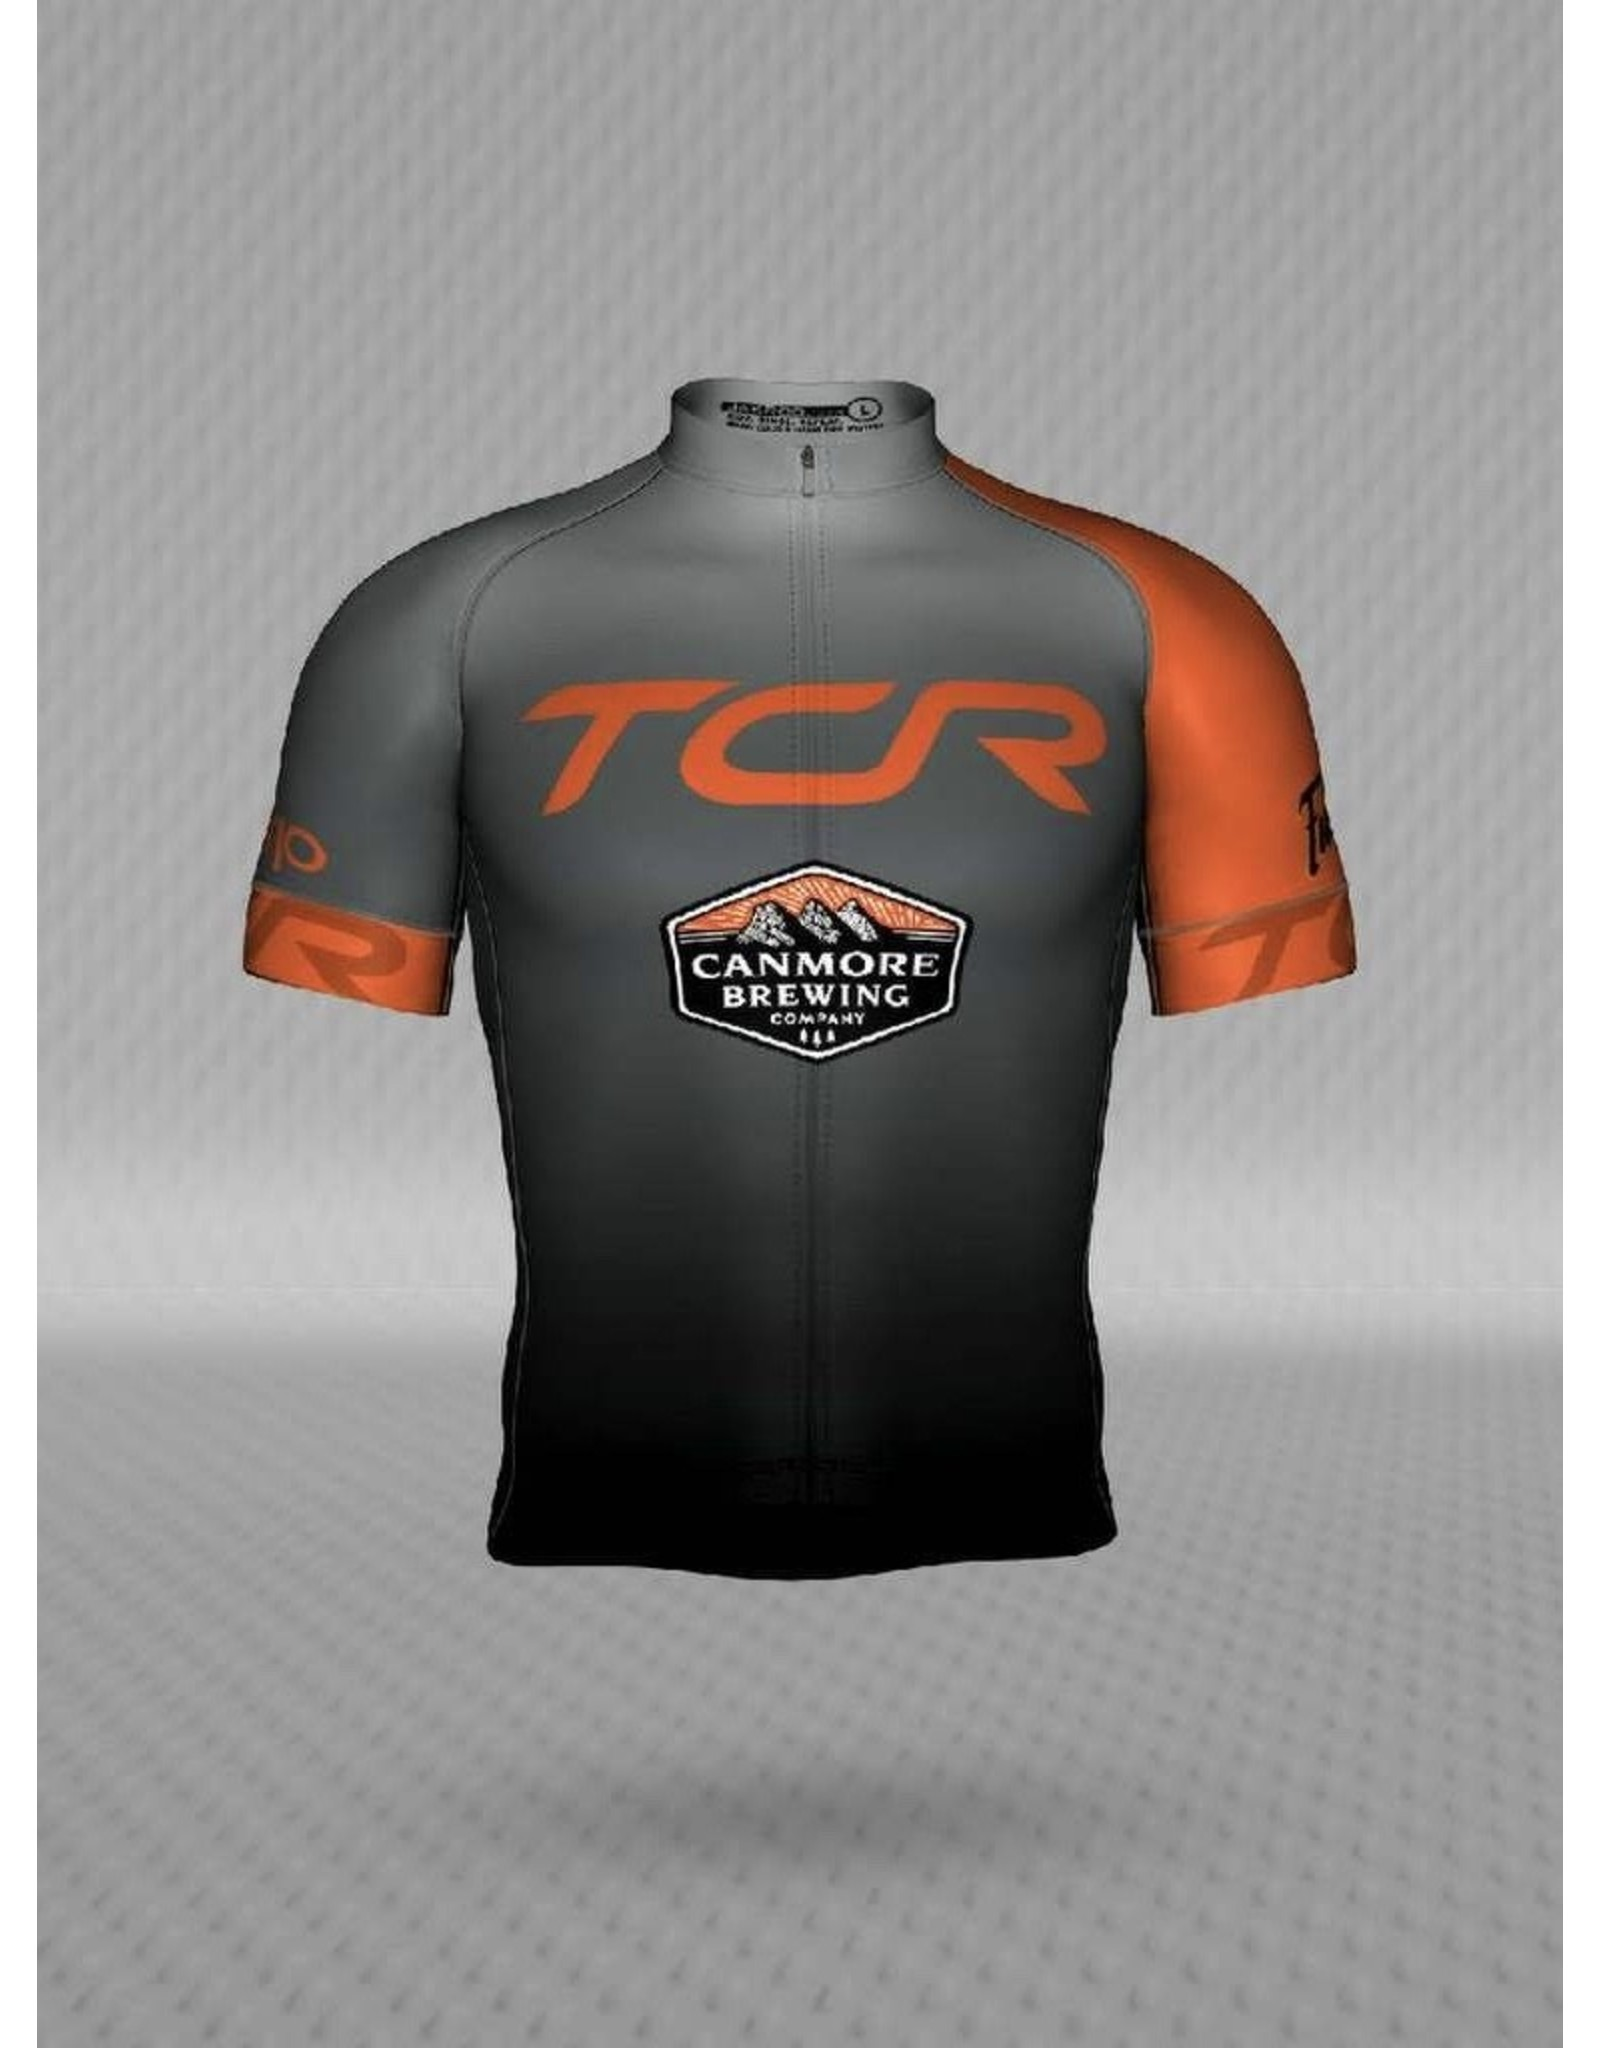 TCR Club Jersey 2020 - Jackroo Nova - Mens  -